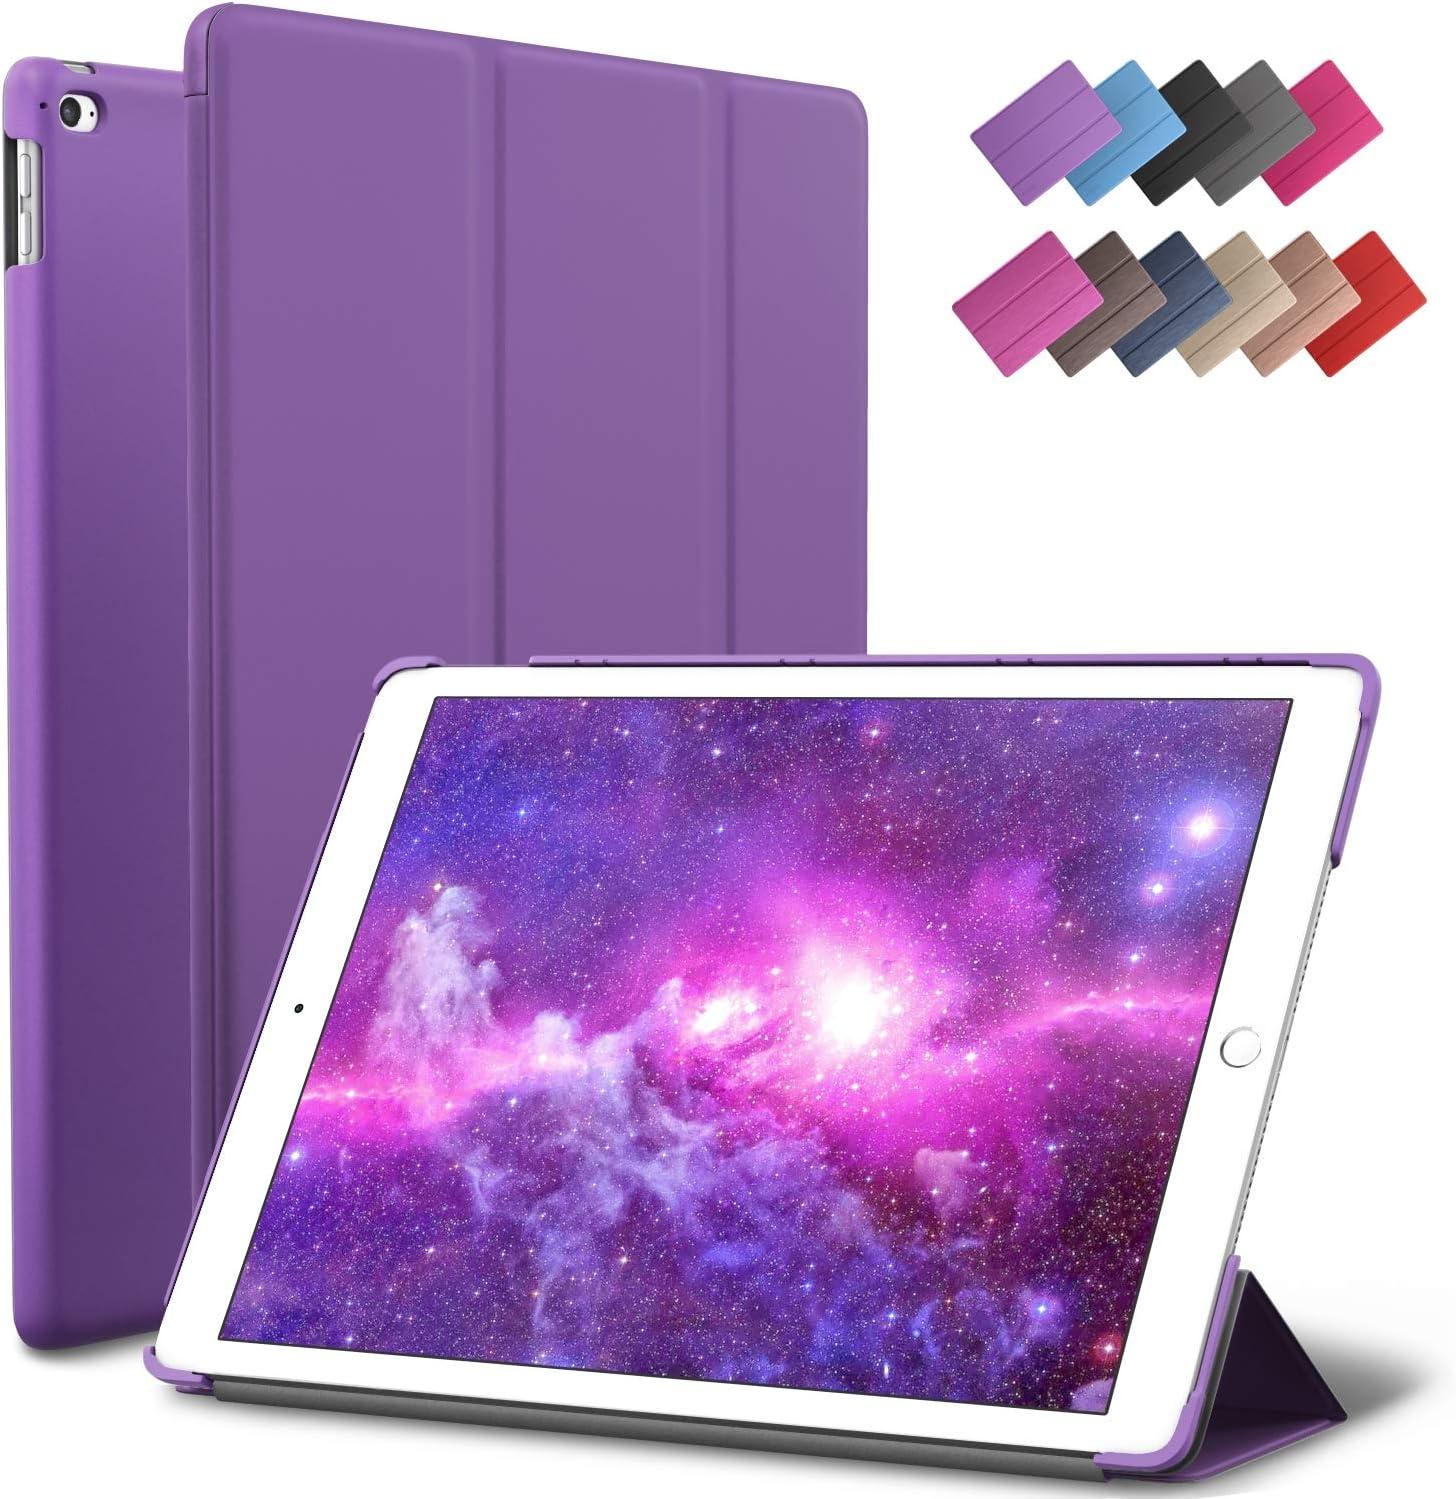 iPad Mini 4 case, ROARTZ Purple Slim Fit Smart Rubber Coated Folio Case Hard Cover Light-Weight Auto Wake/Sleep for Apple iPad Mini 4th Generation Model A1538/A1550 Retina Display